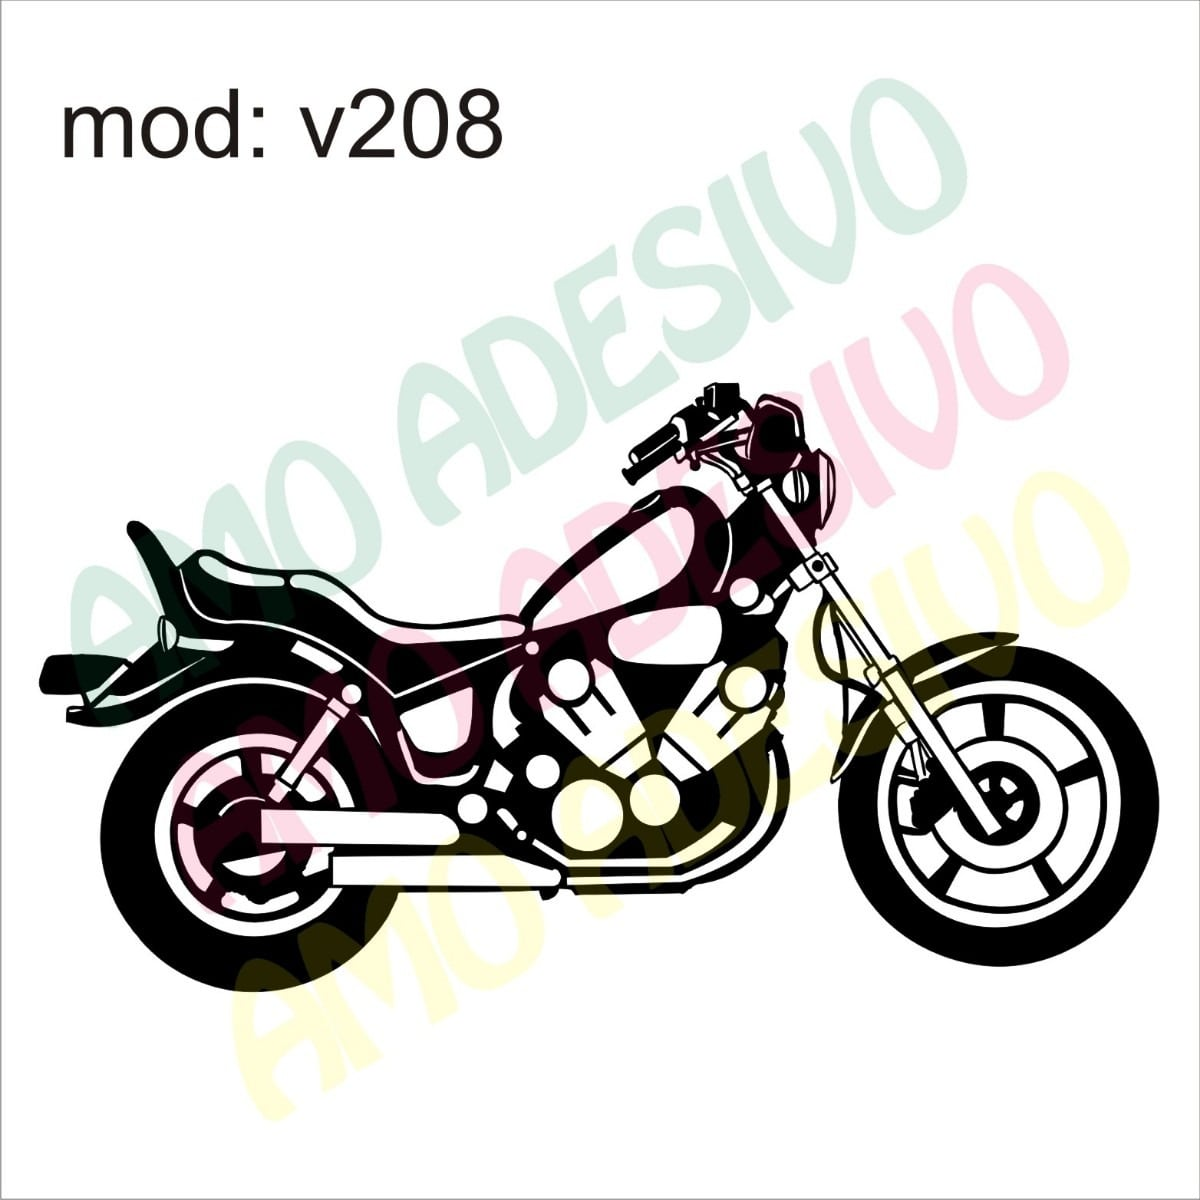 adesivo_v208_moto_desenho_abstrato_decorativo_parede_d_nq_np_13431_mlb20078030741_042014_f_8.jpg